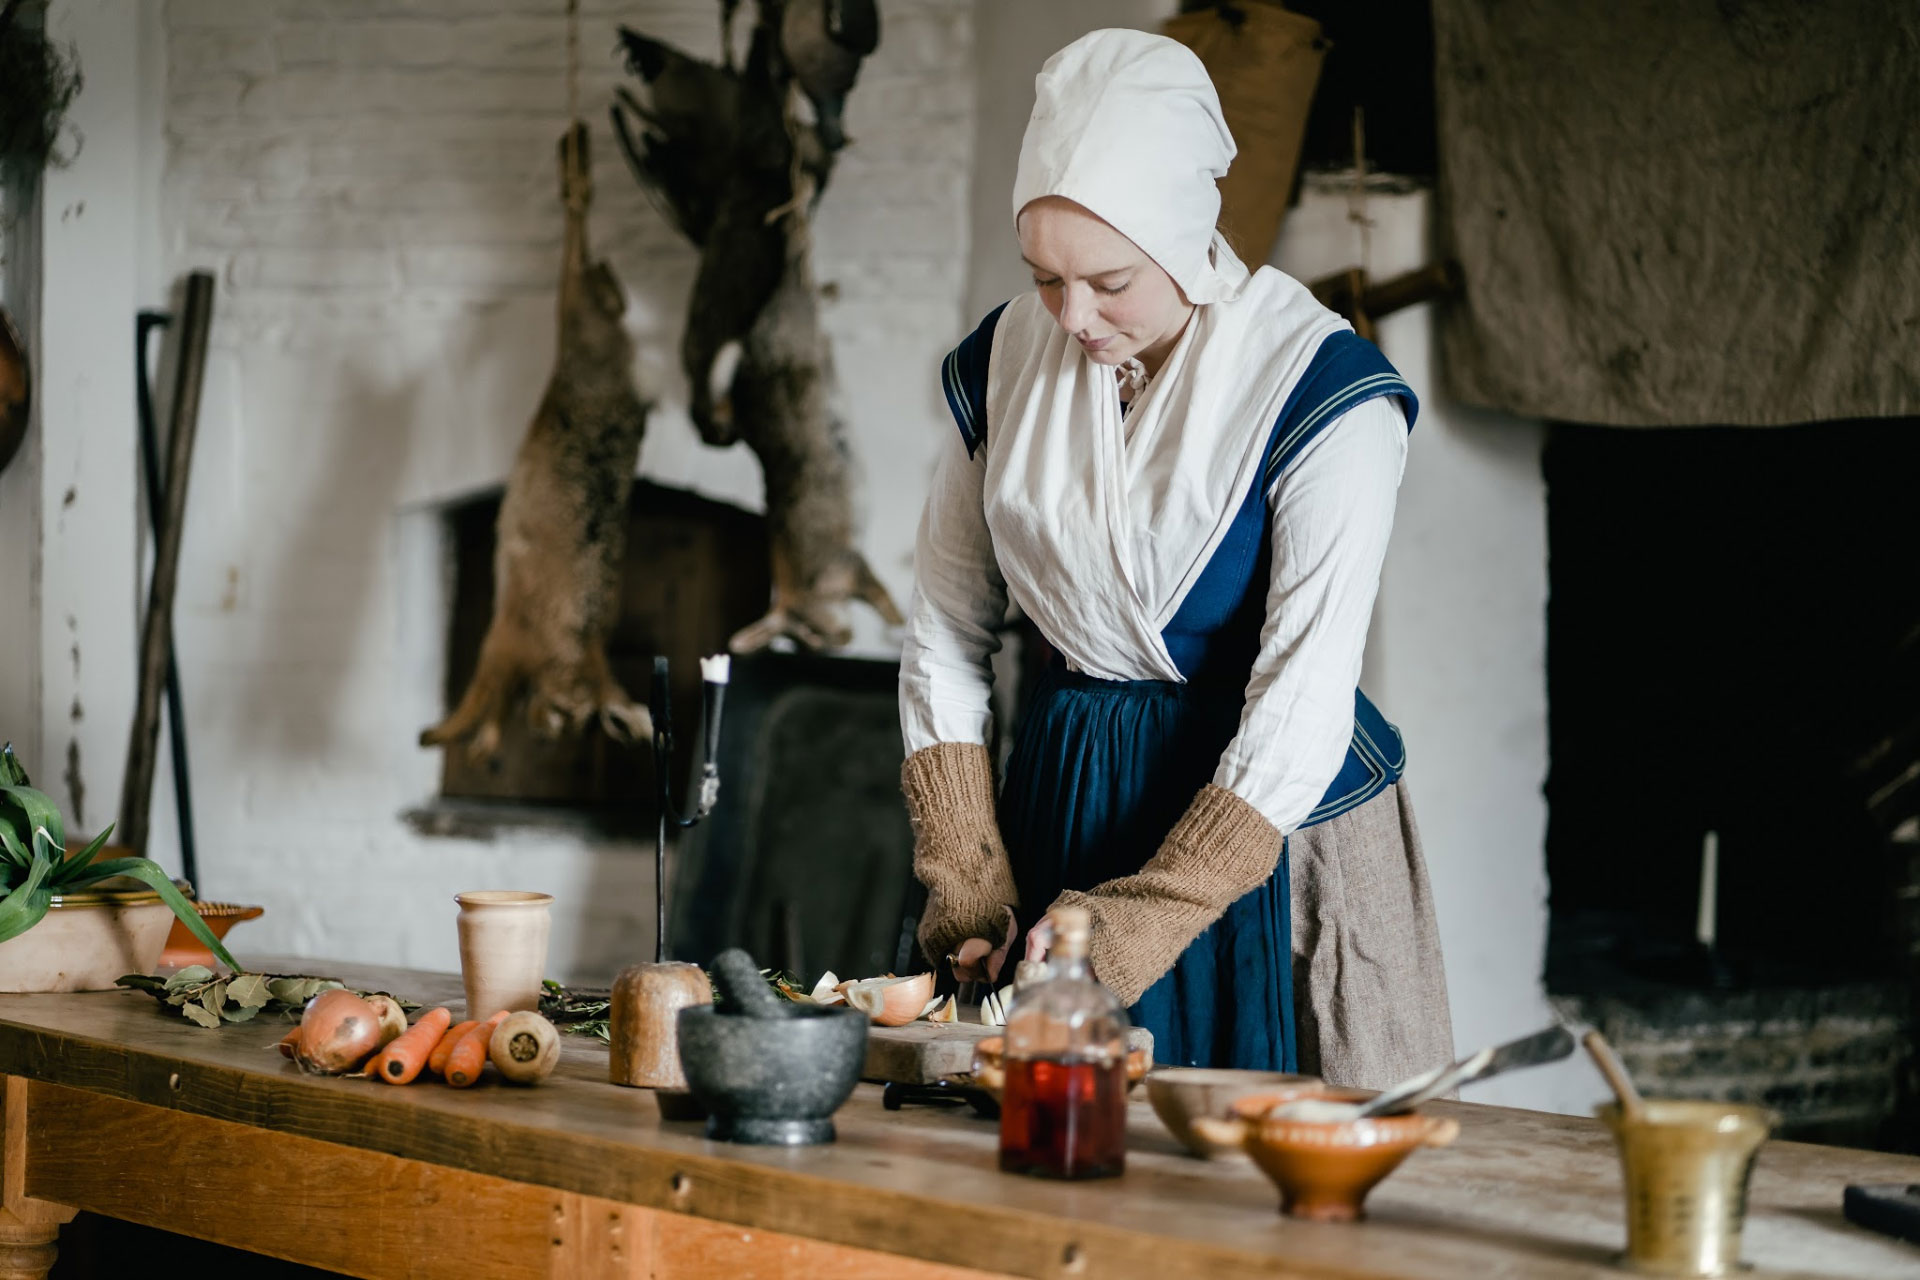 Llancaiach Fawr Manor servant in kitchen BANNER IMAGE 1920 pixels